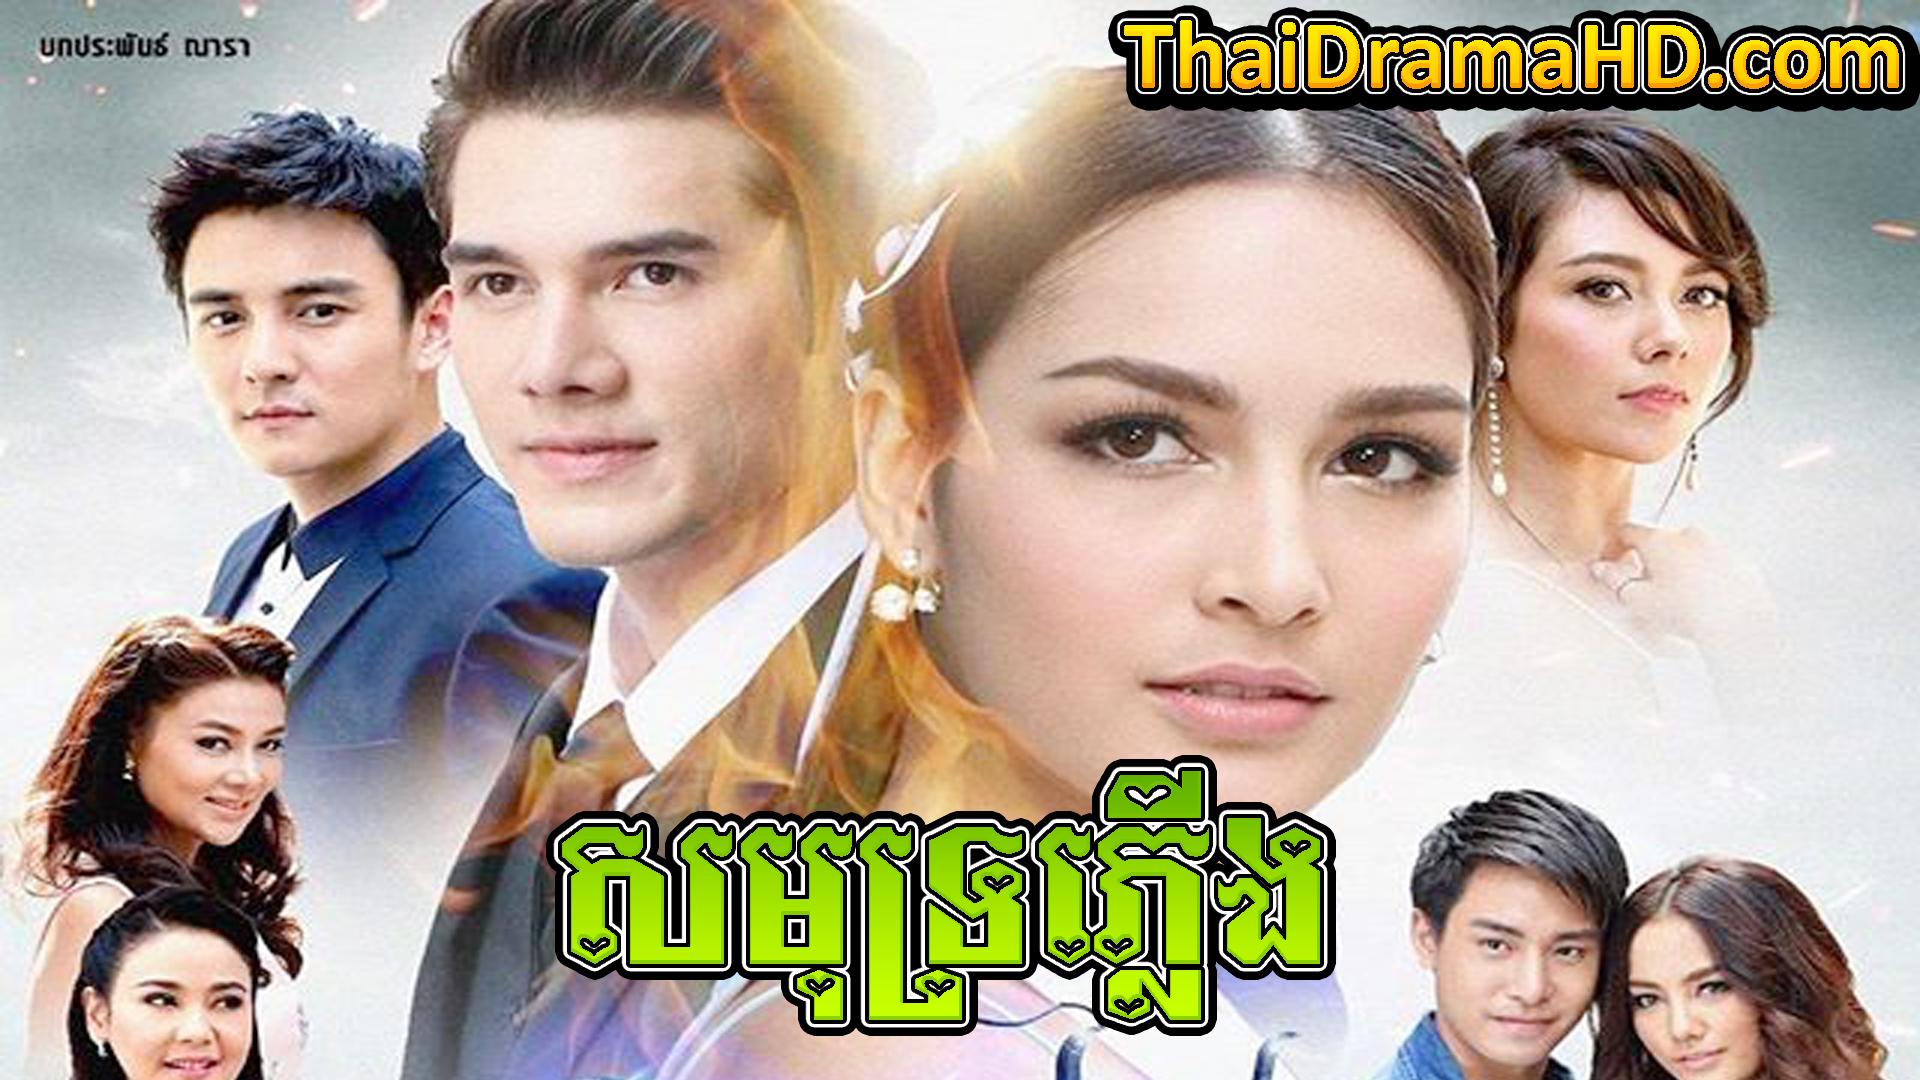 Samoth Phleung | Thai Drama | Thai Drama HD | Khmer Movie | Phumikhmer | Phumikhmer1 | movie-khmer | video4khmer | khmotions | kolabkhmer | khmer drama | ksdrama | cookingtips | roscheat | khmertimeskh | khmerkomsan | phumi7 | merlkon | film2us | movie2kh | sweetdrama | khmercitylove | khreplay | tvb cambodia drama | ckh7 | srokthai | phumimedia | phumi8 | khmer avenue | khmer search | Soyo | khmerfans